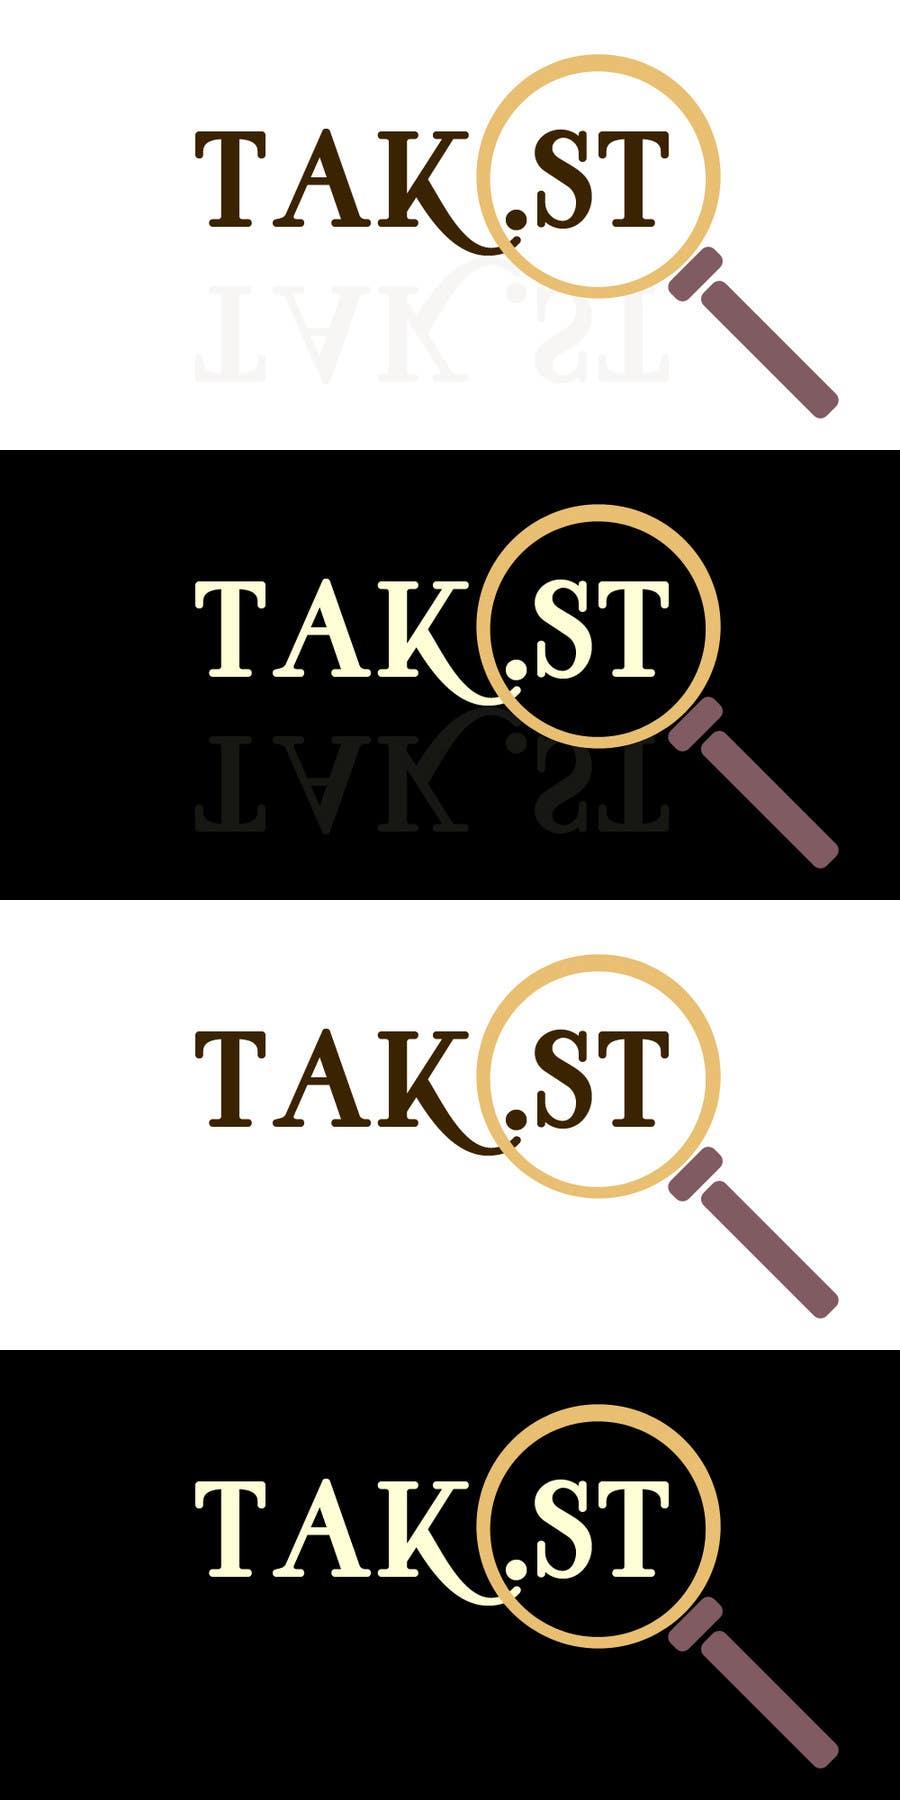 Konkurrenceindlæg #7 for Design a Logo for appraiser company